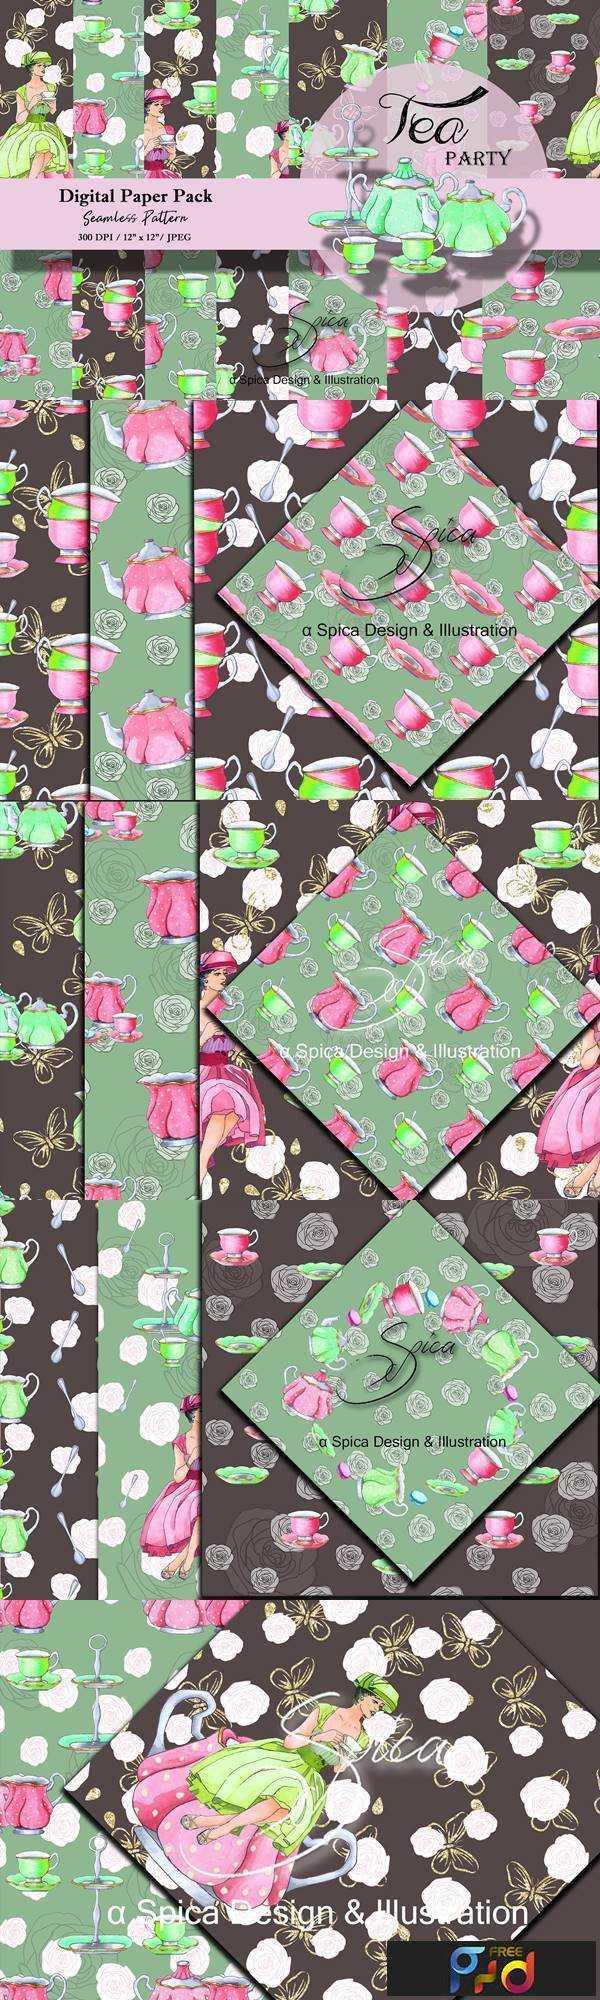 1806070 Tea party Digital paper pack 2458297 1